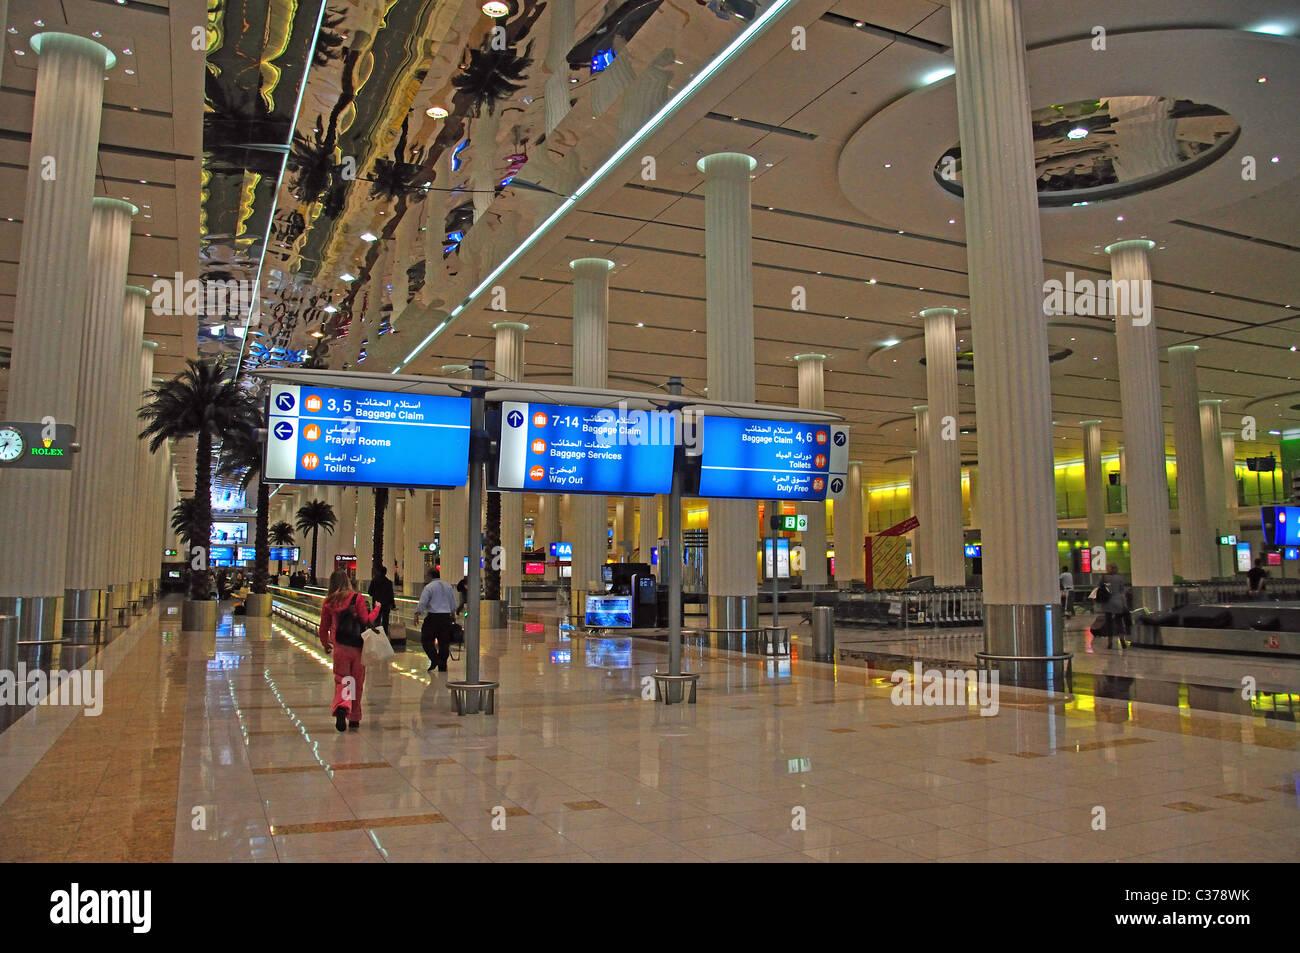 Arrivals to Dubai International Airport (DXB): 2018-10-17